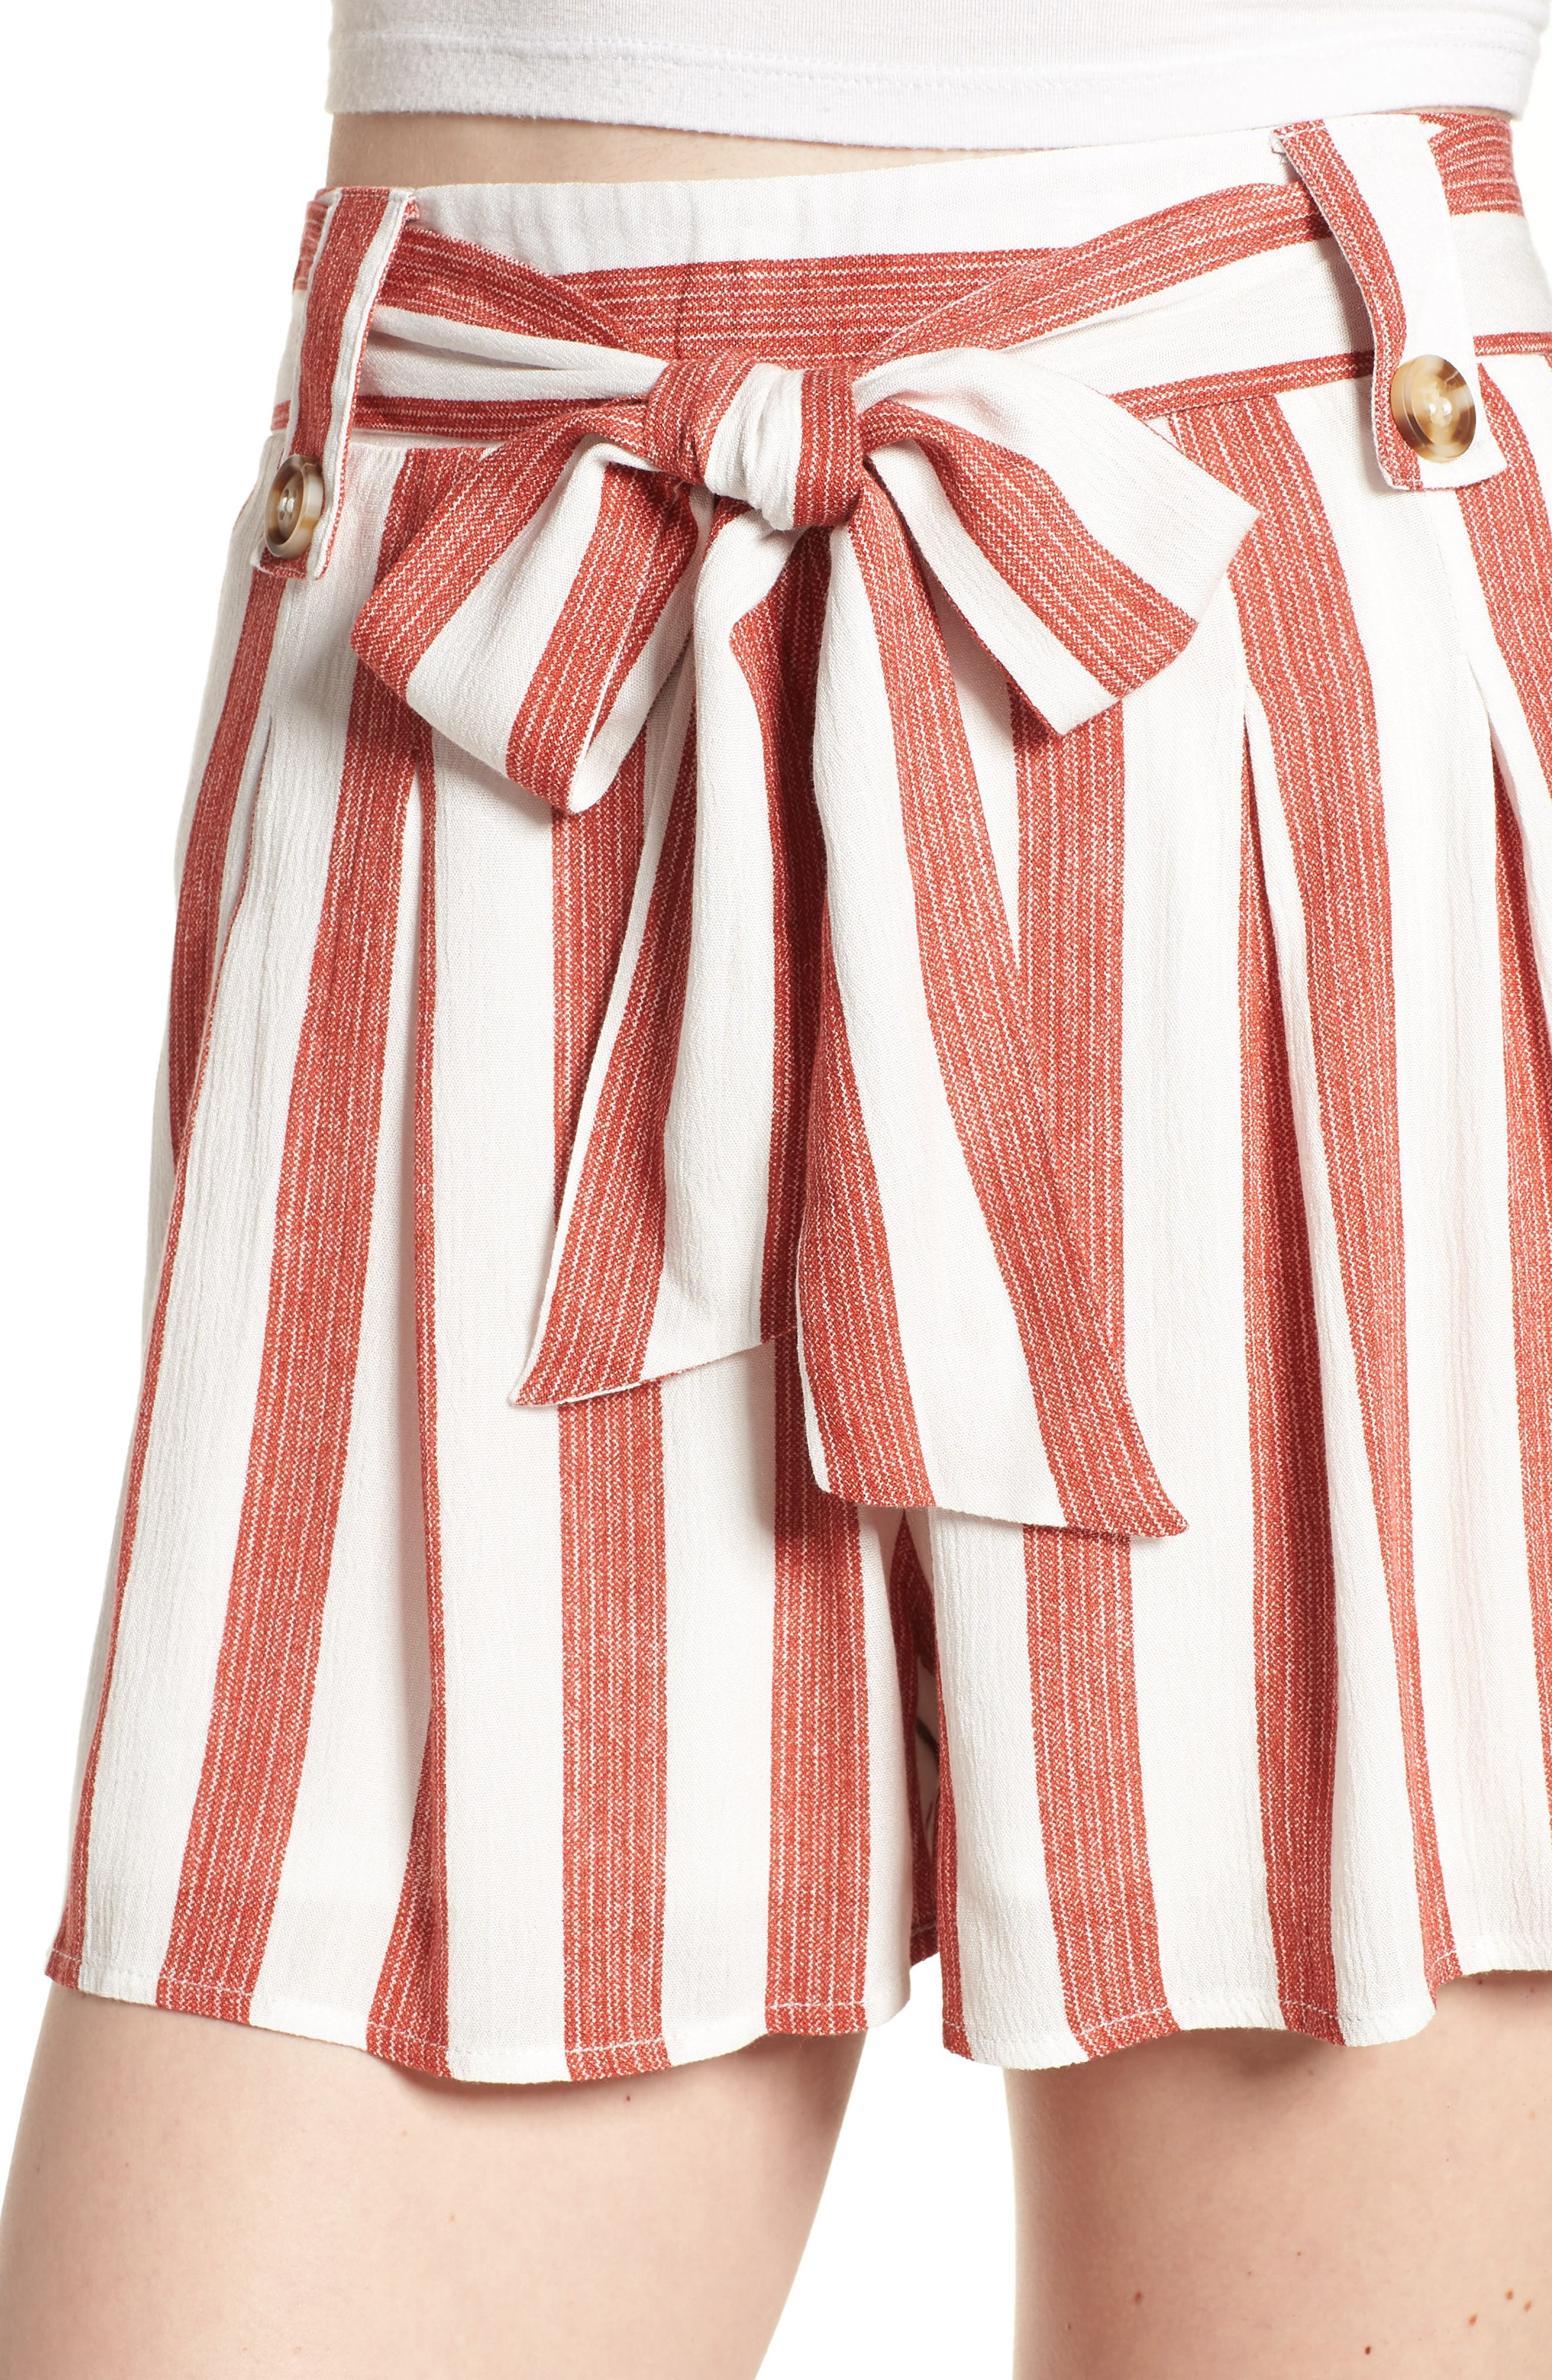 Stripe Shorts,                             Alternate thumbnail 5, color,                             Red/ Ivory